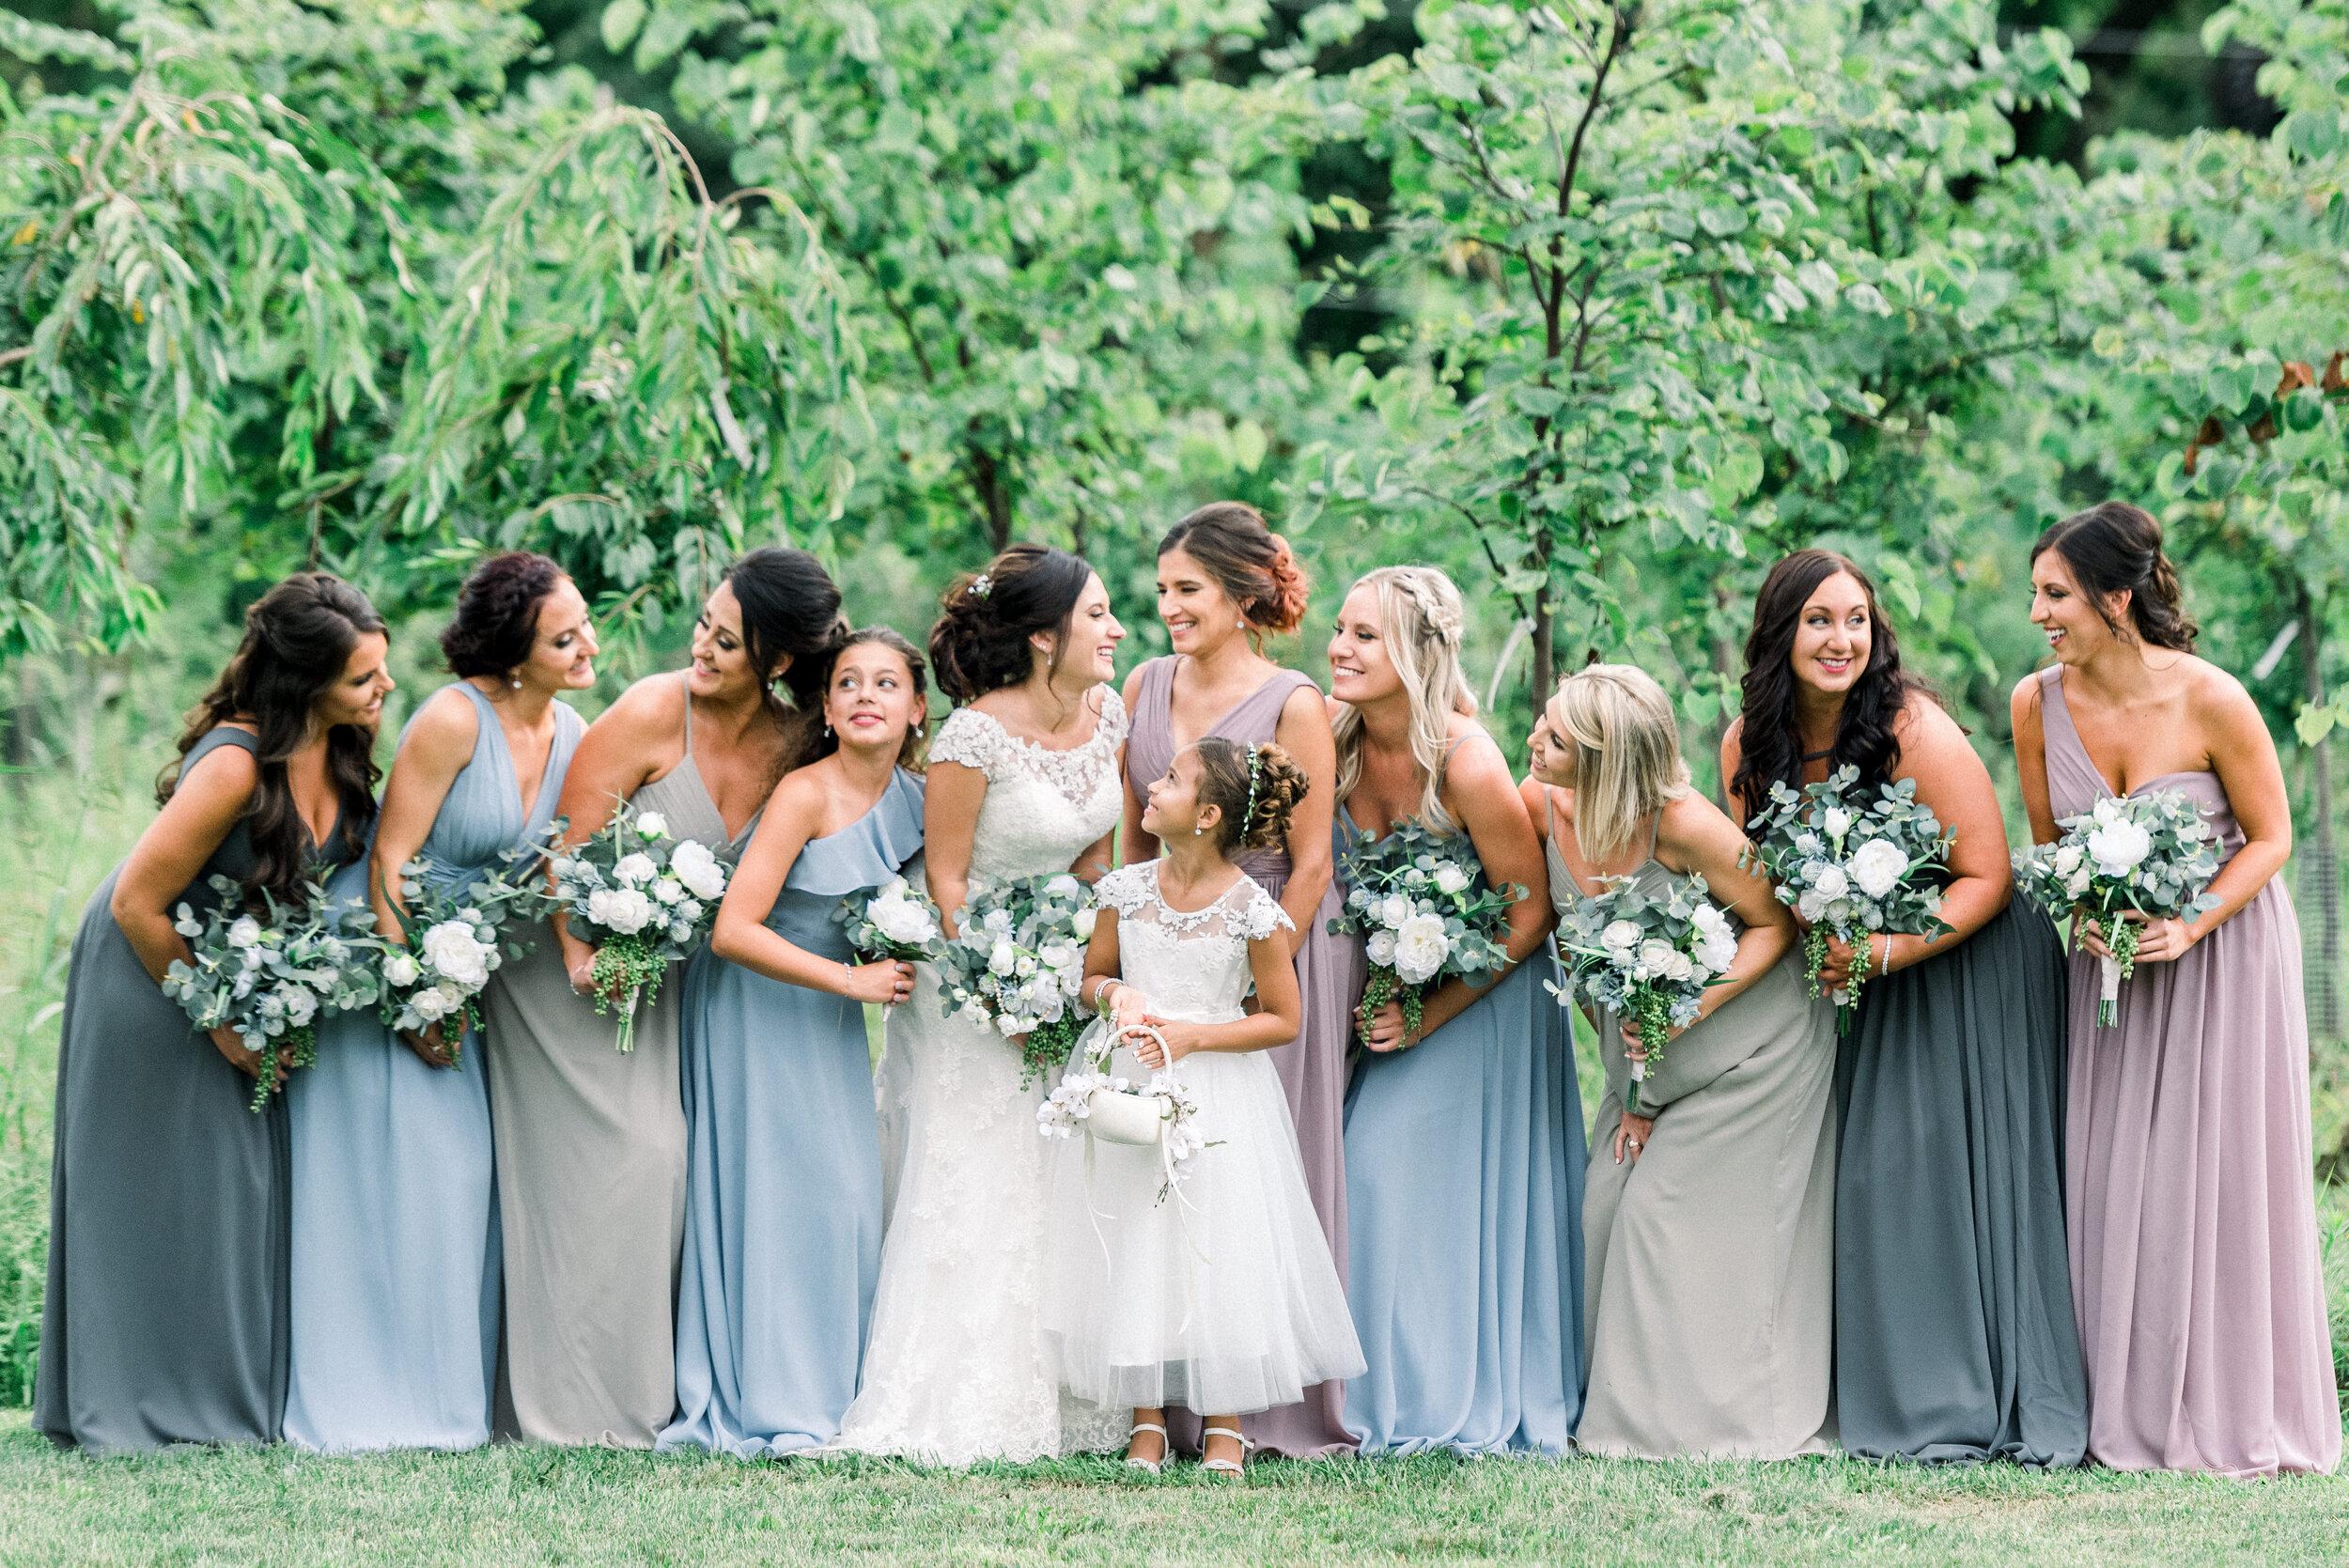 Pinehall-At-Eisler-Farms-Wedding-Ashley-Reed-Photography-25.jpg